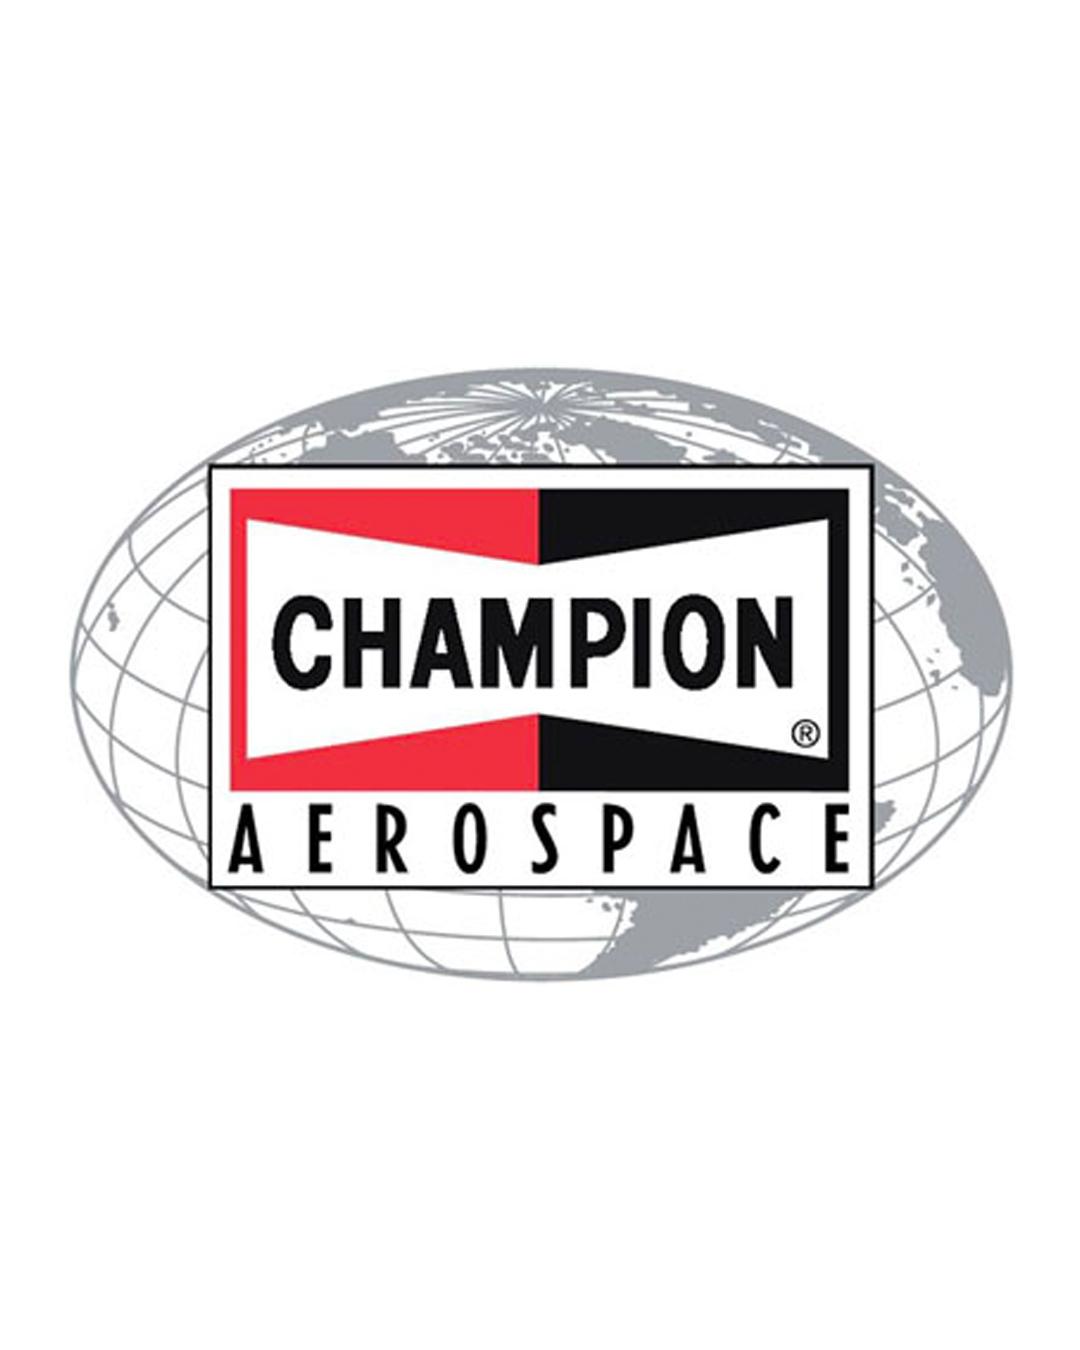 champion_aerospace.jpg